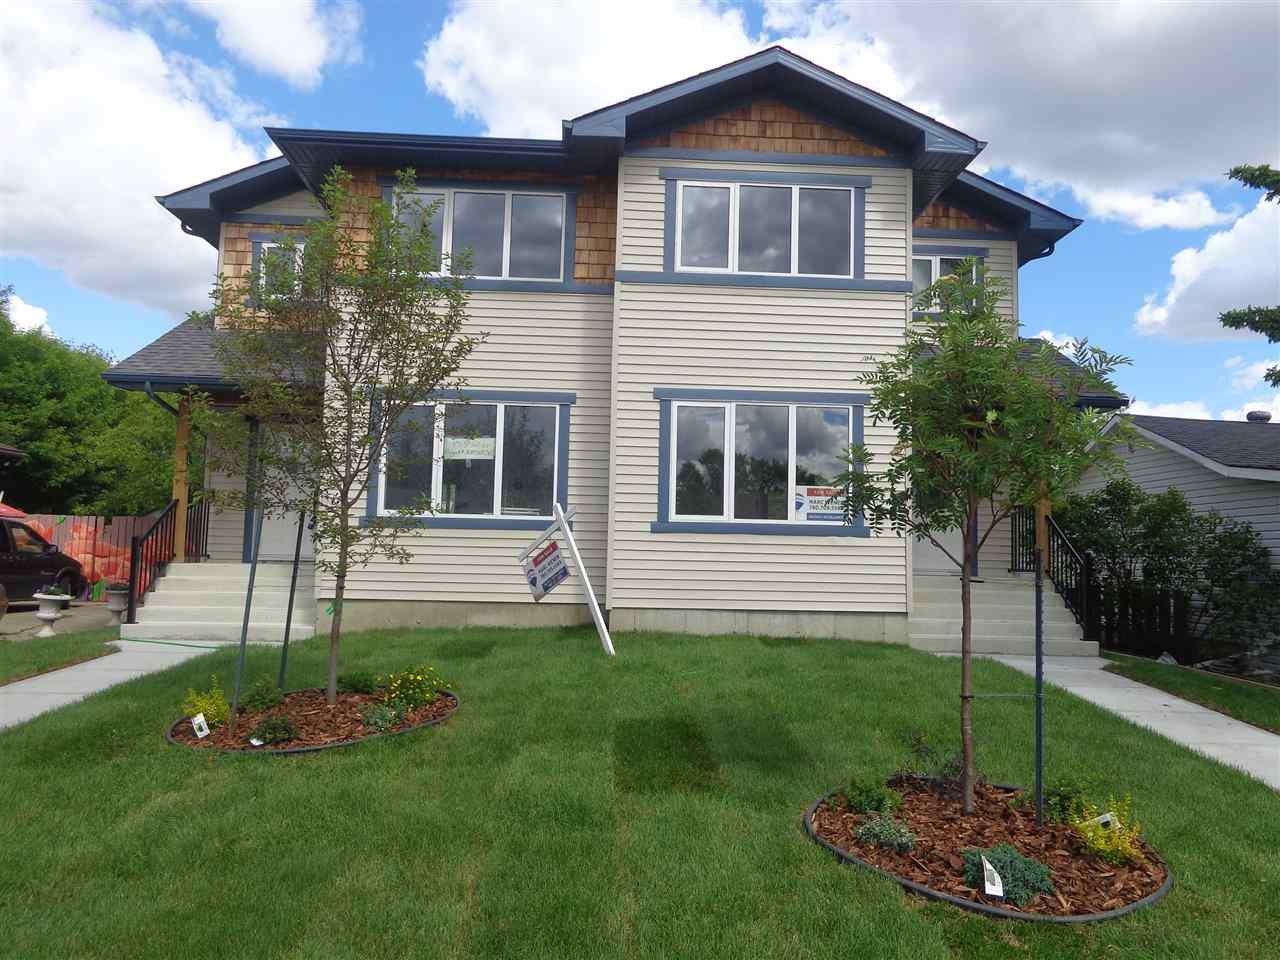 Main Photo: 9713 161 Street in Edmonton: Zone 22 House Half Duplex for sale : MLS®# E4204660